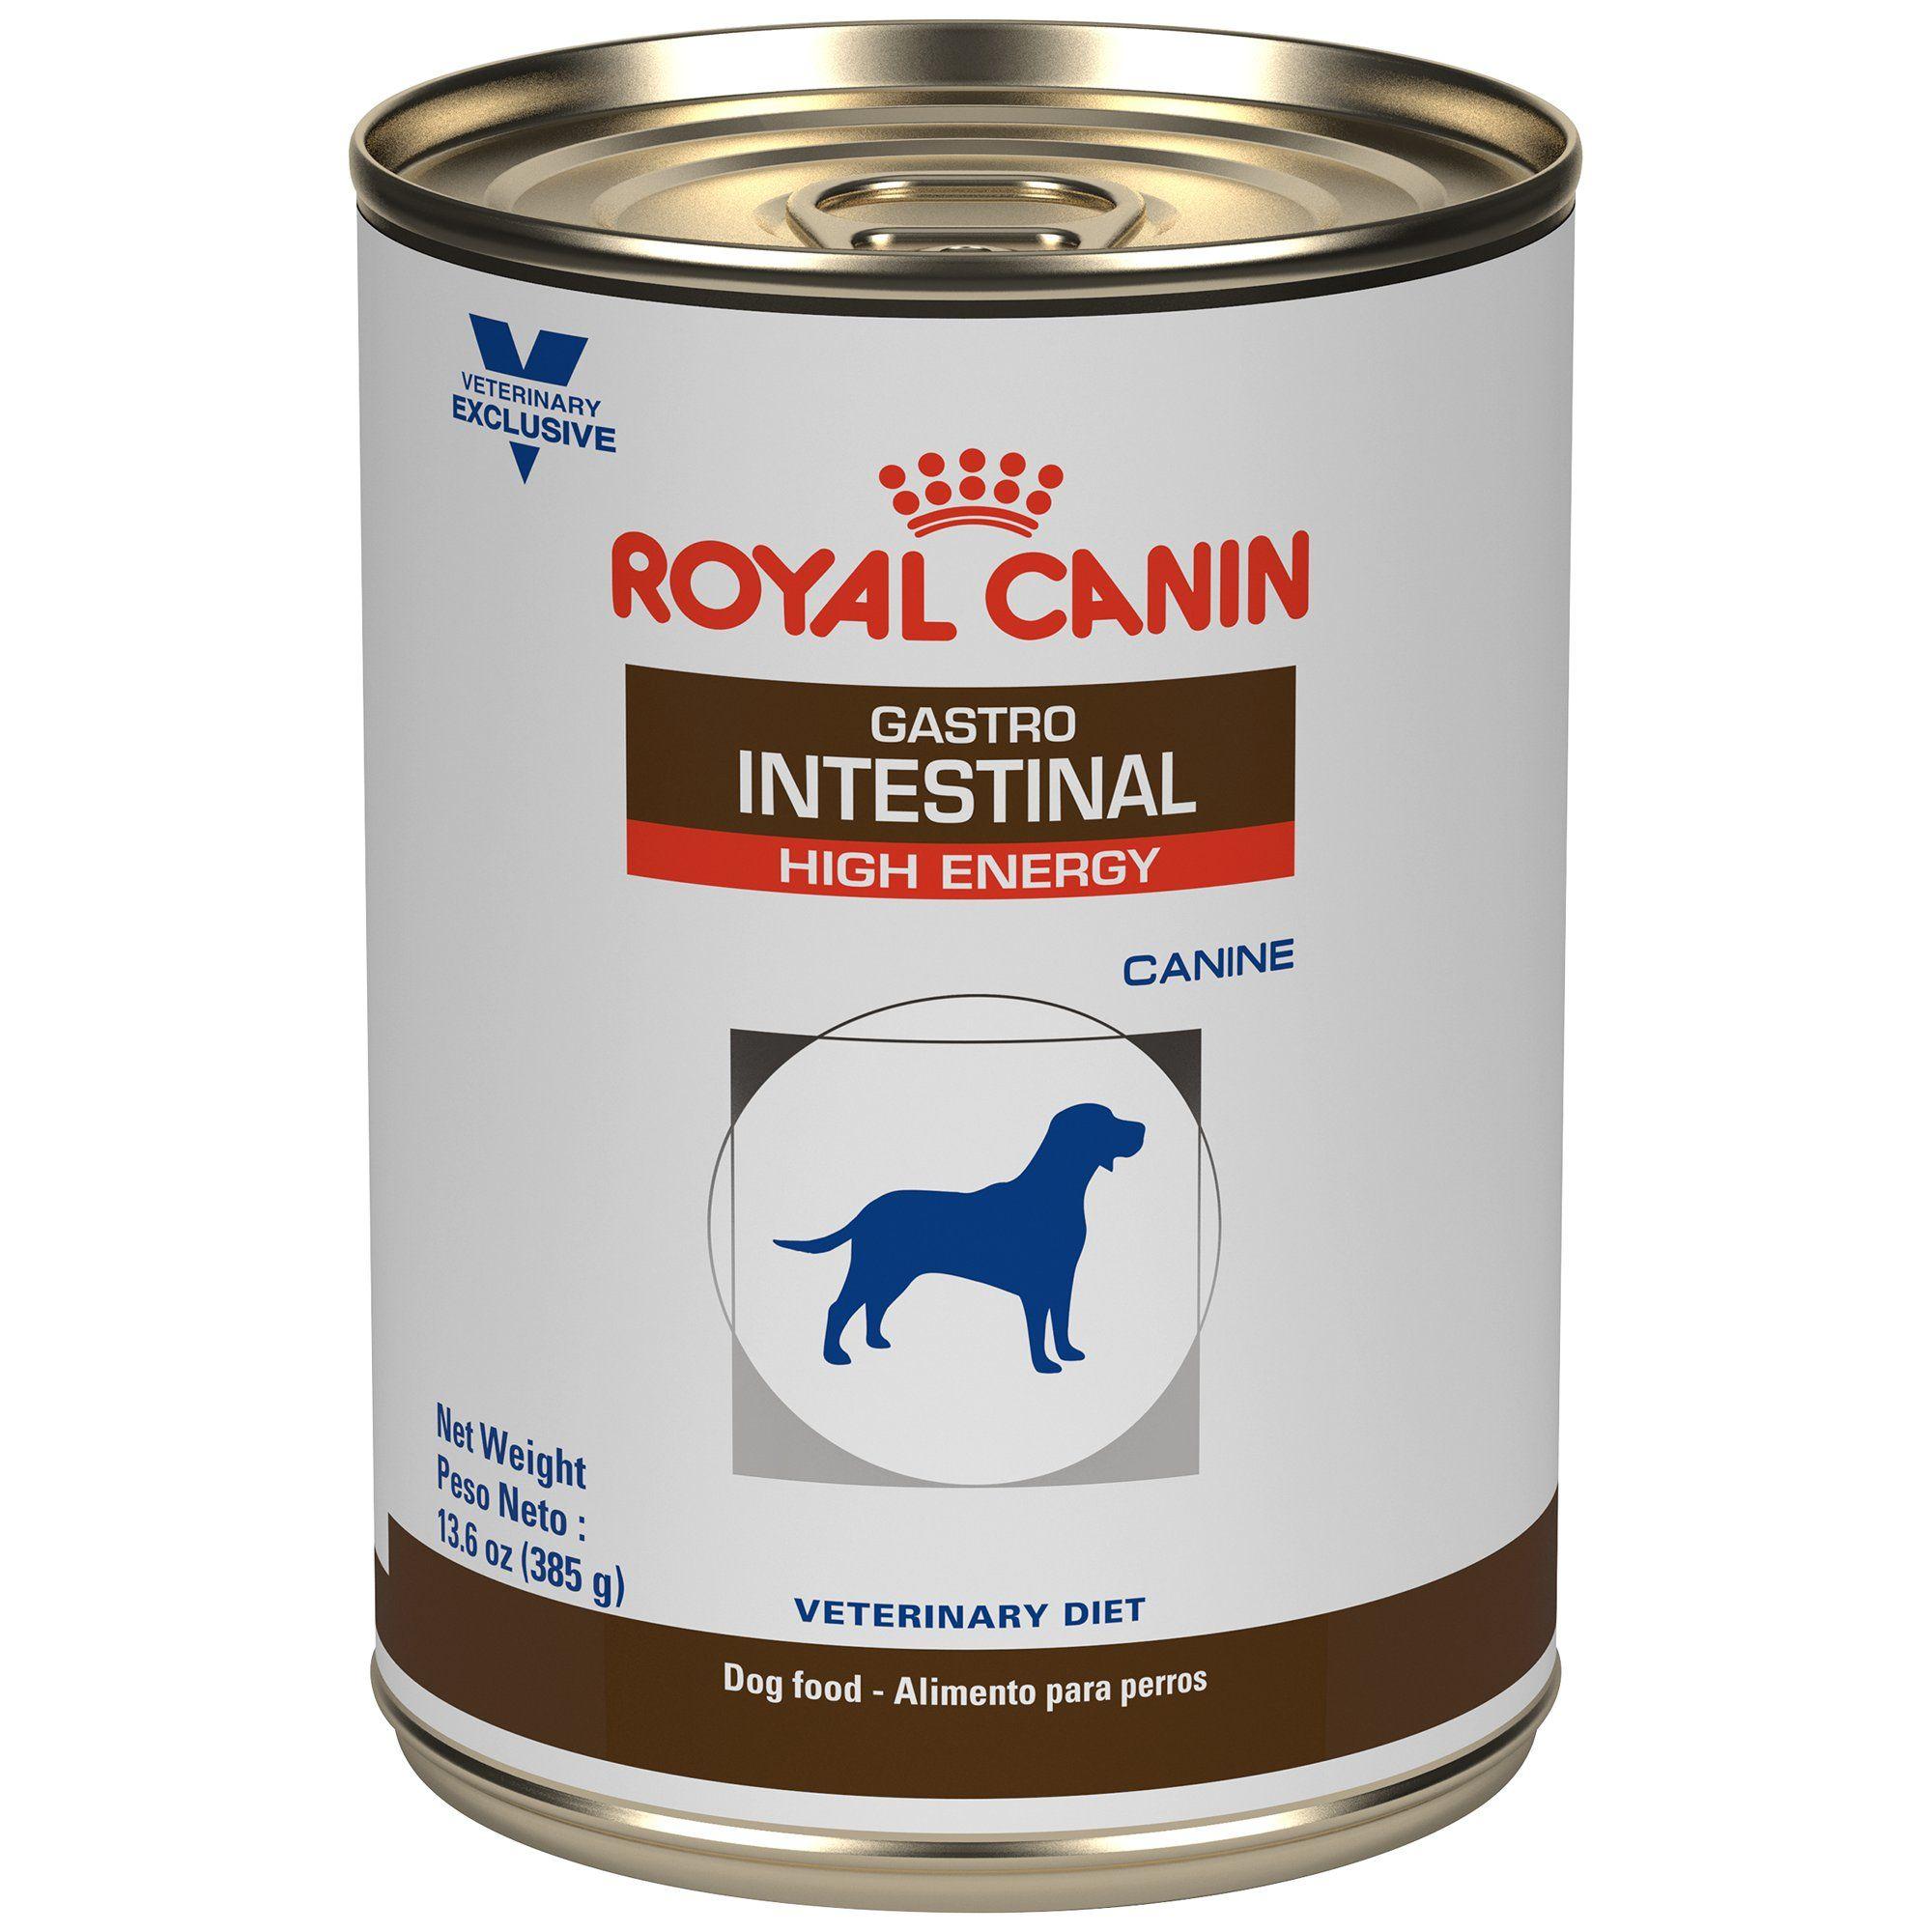 Royal Canin Veterinary Diet Gastrointestinal High Energy In Gel